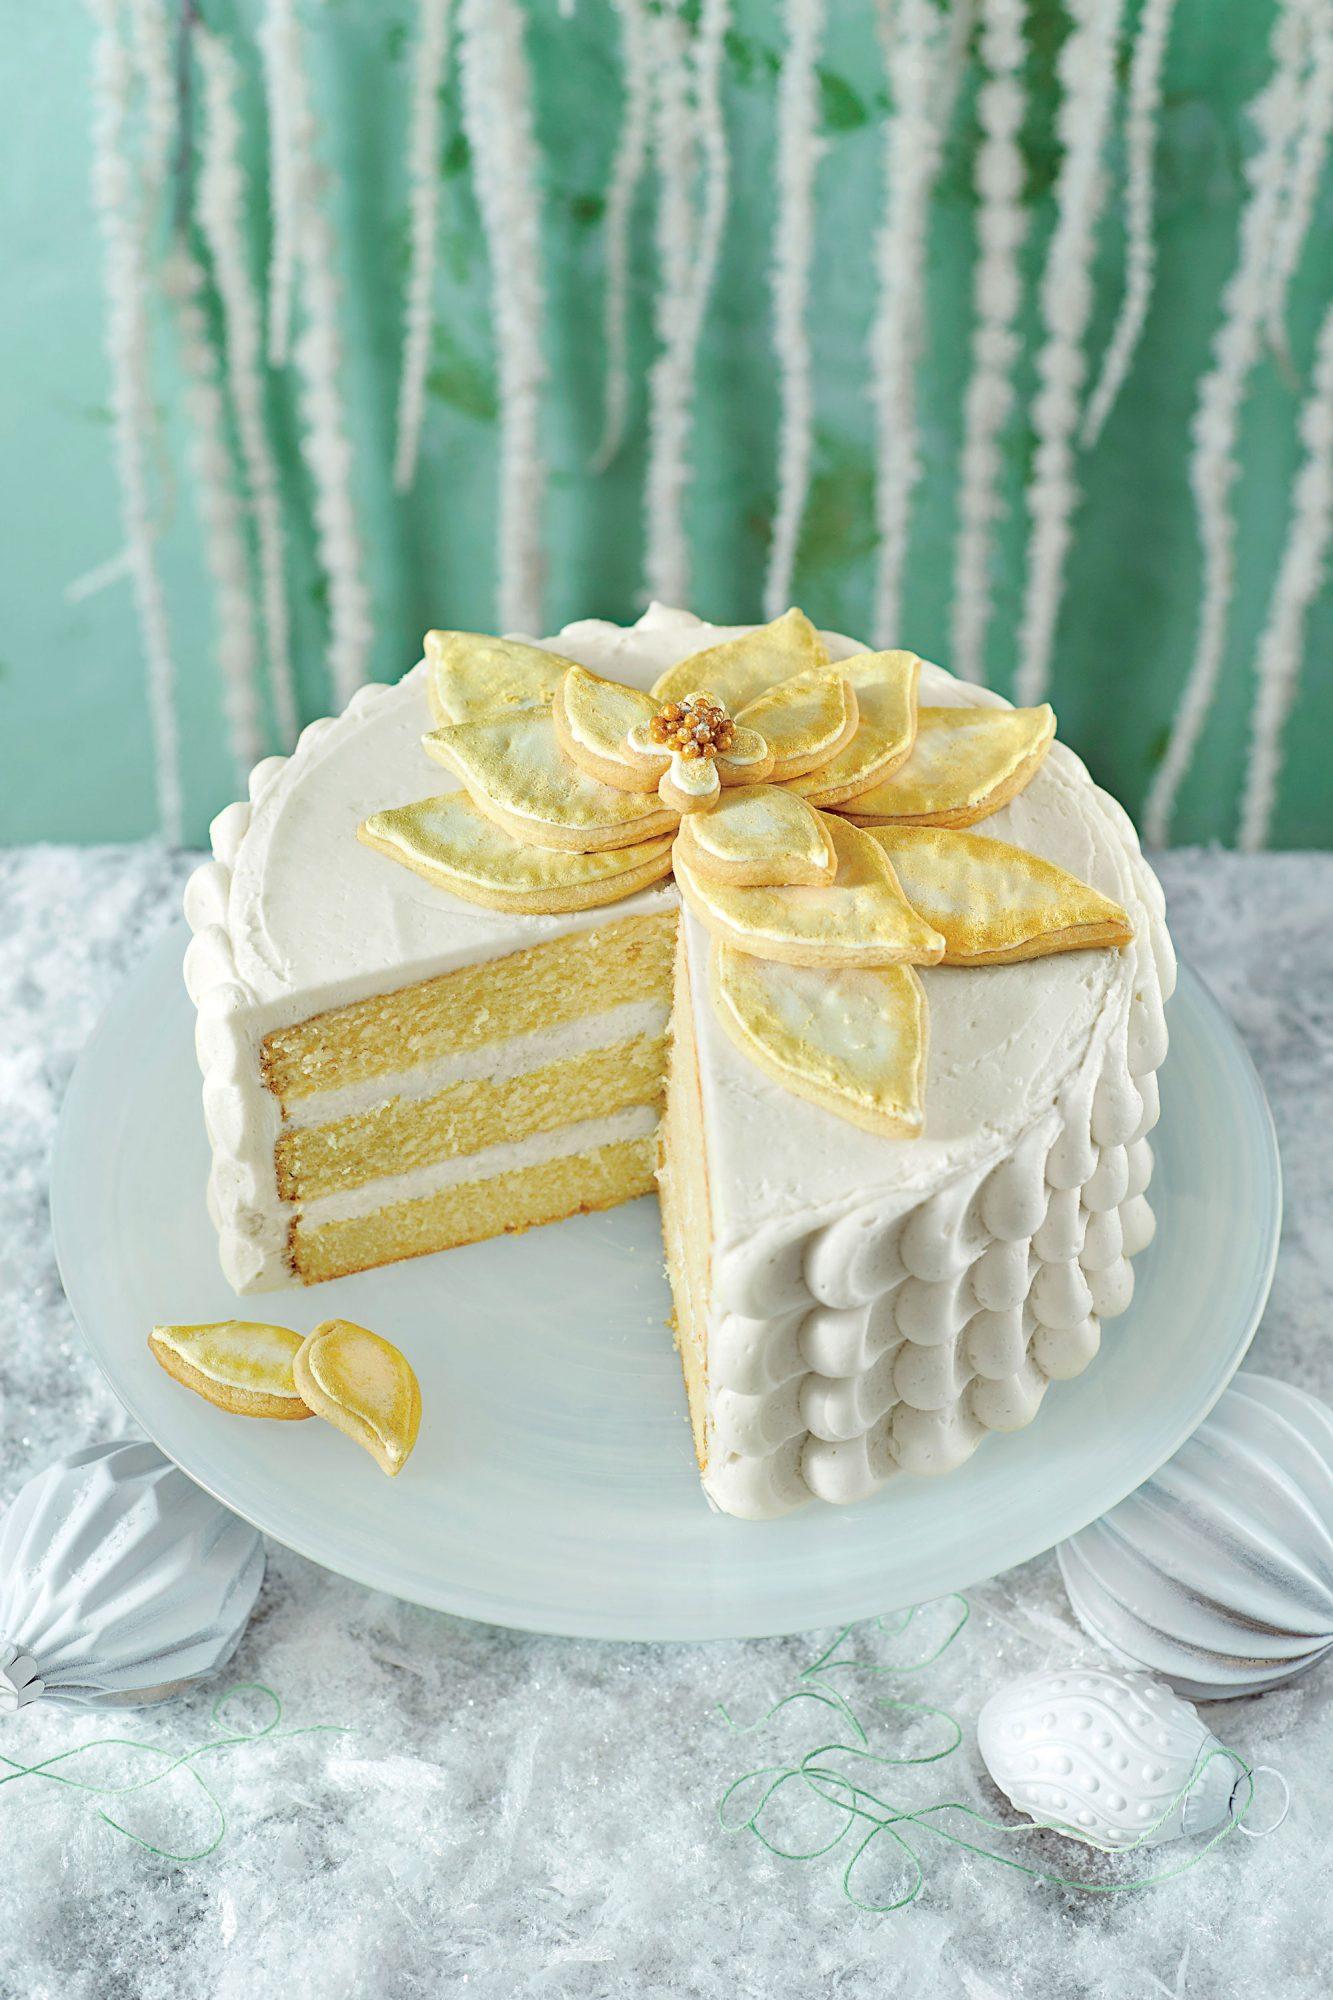 White Chocolate Poinsettia Cake Southern Living